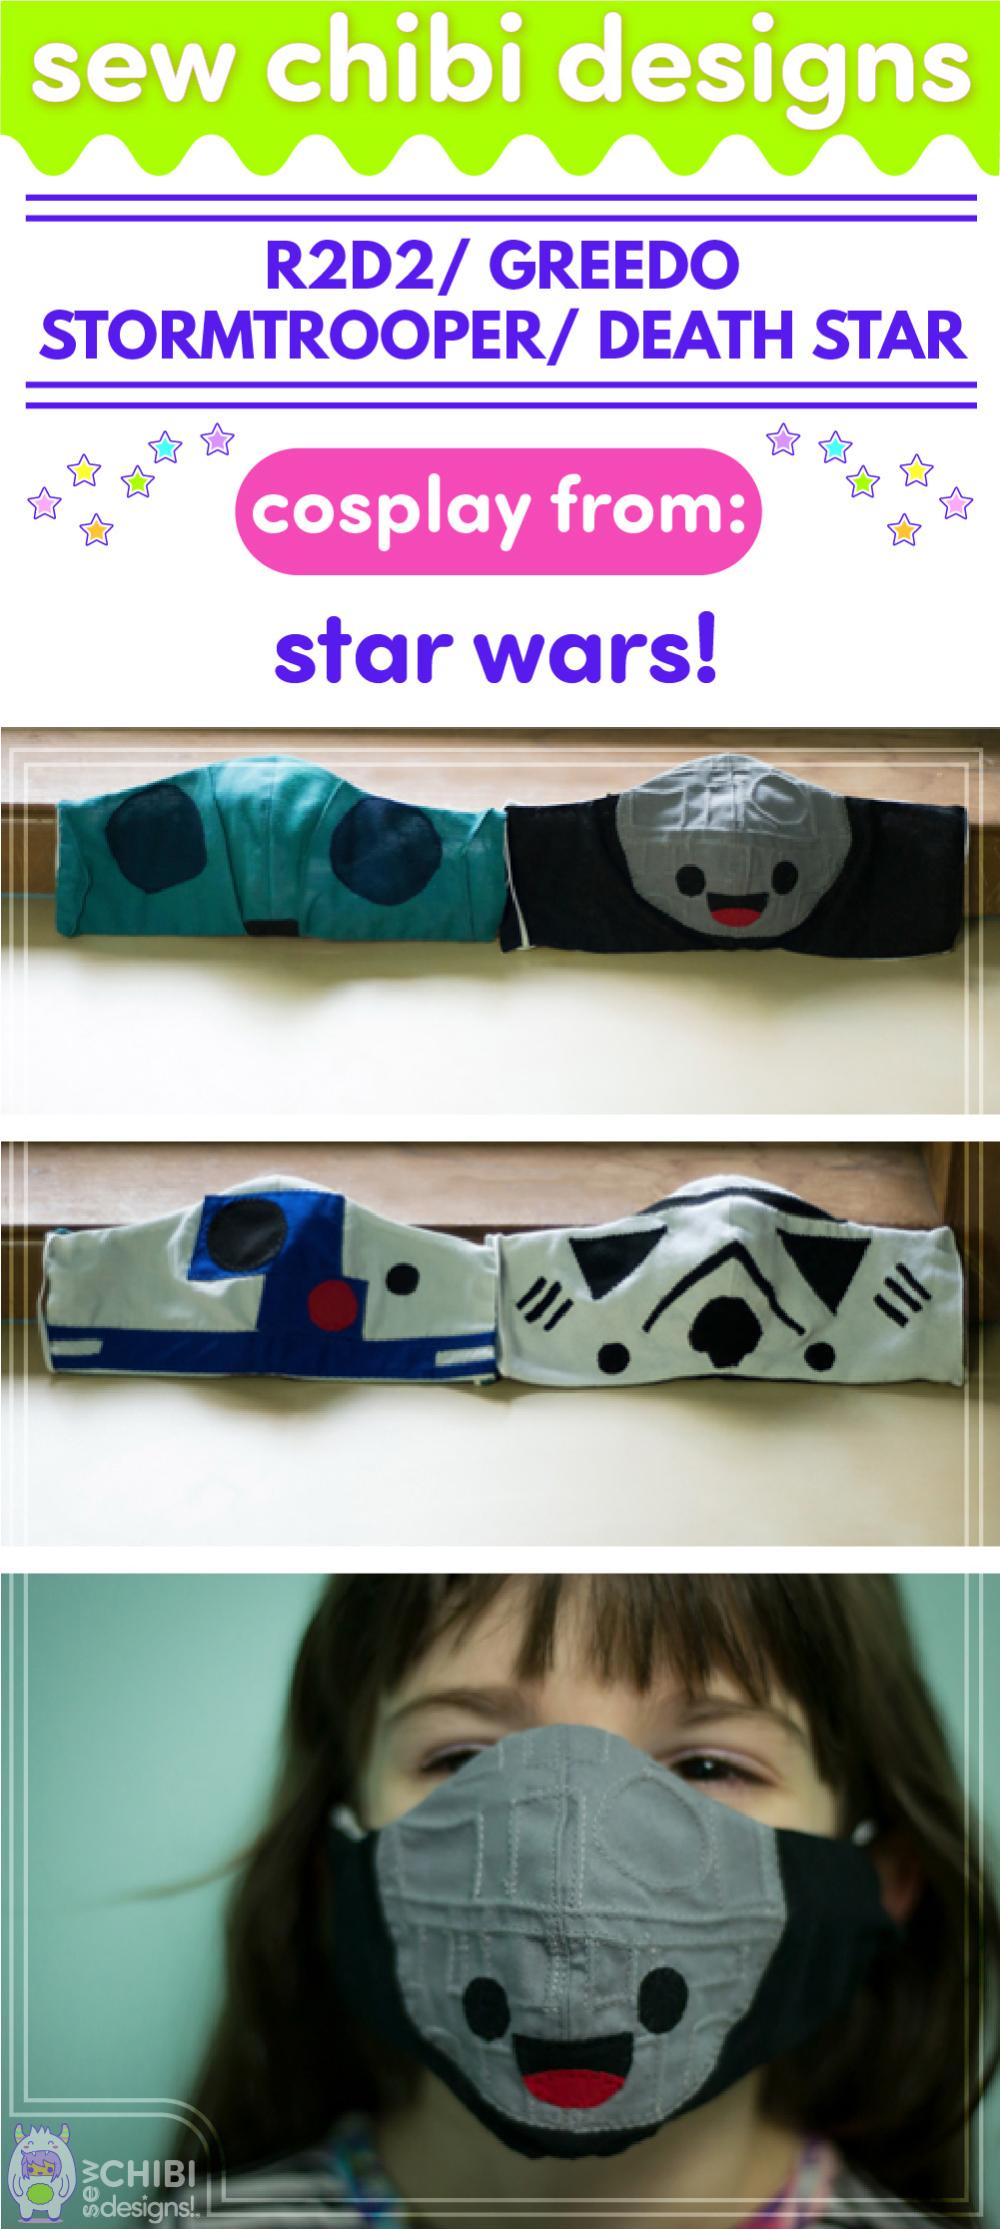 Star Wars Inspired Face Masks Sew Chibi Designs In 2020 Star Wars Inspired Star Wars Sewing Star Wars